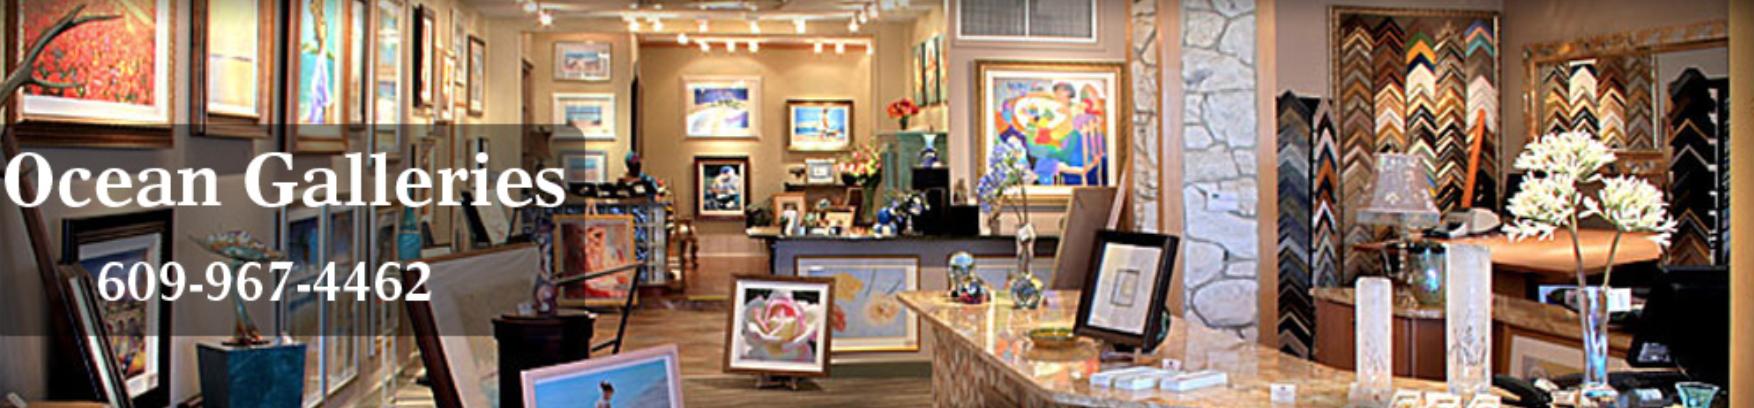 Ocean Galleries, Avalon and Stone Harbor NJ